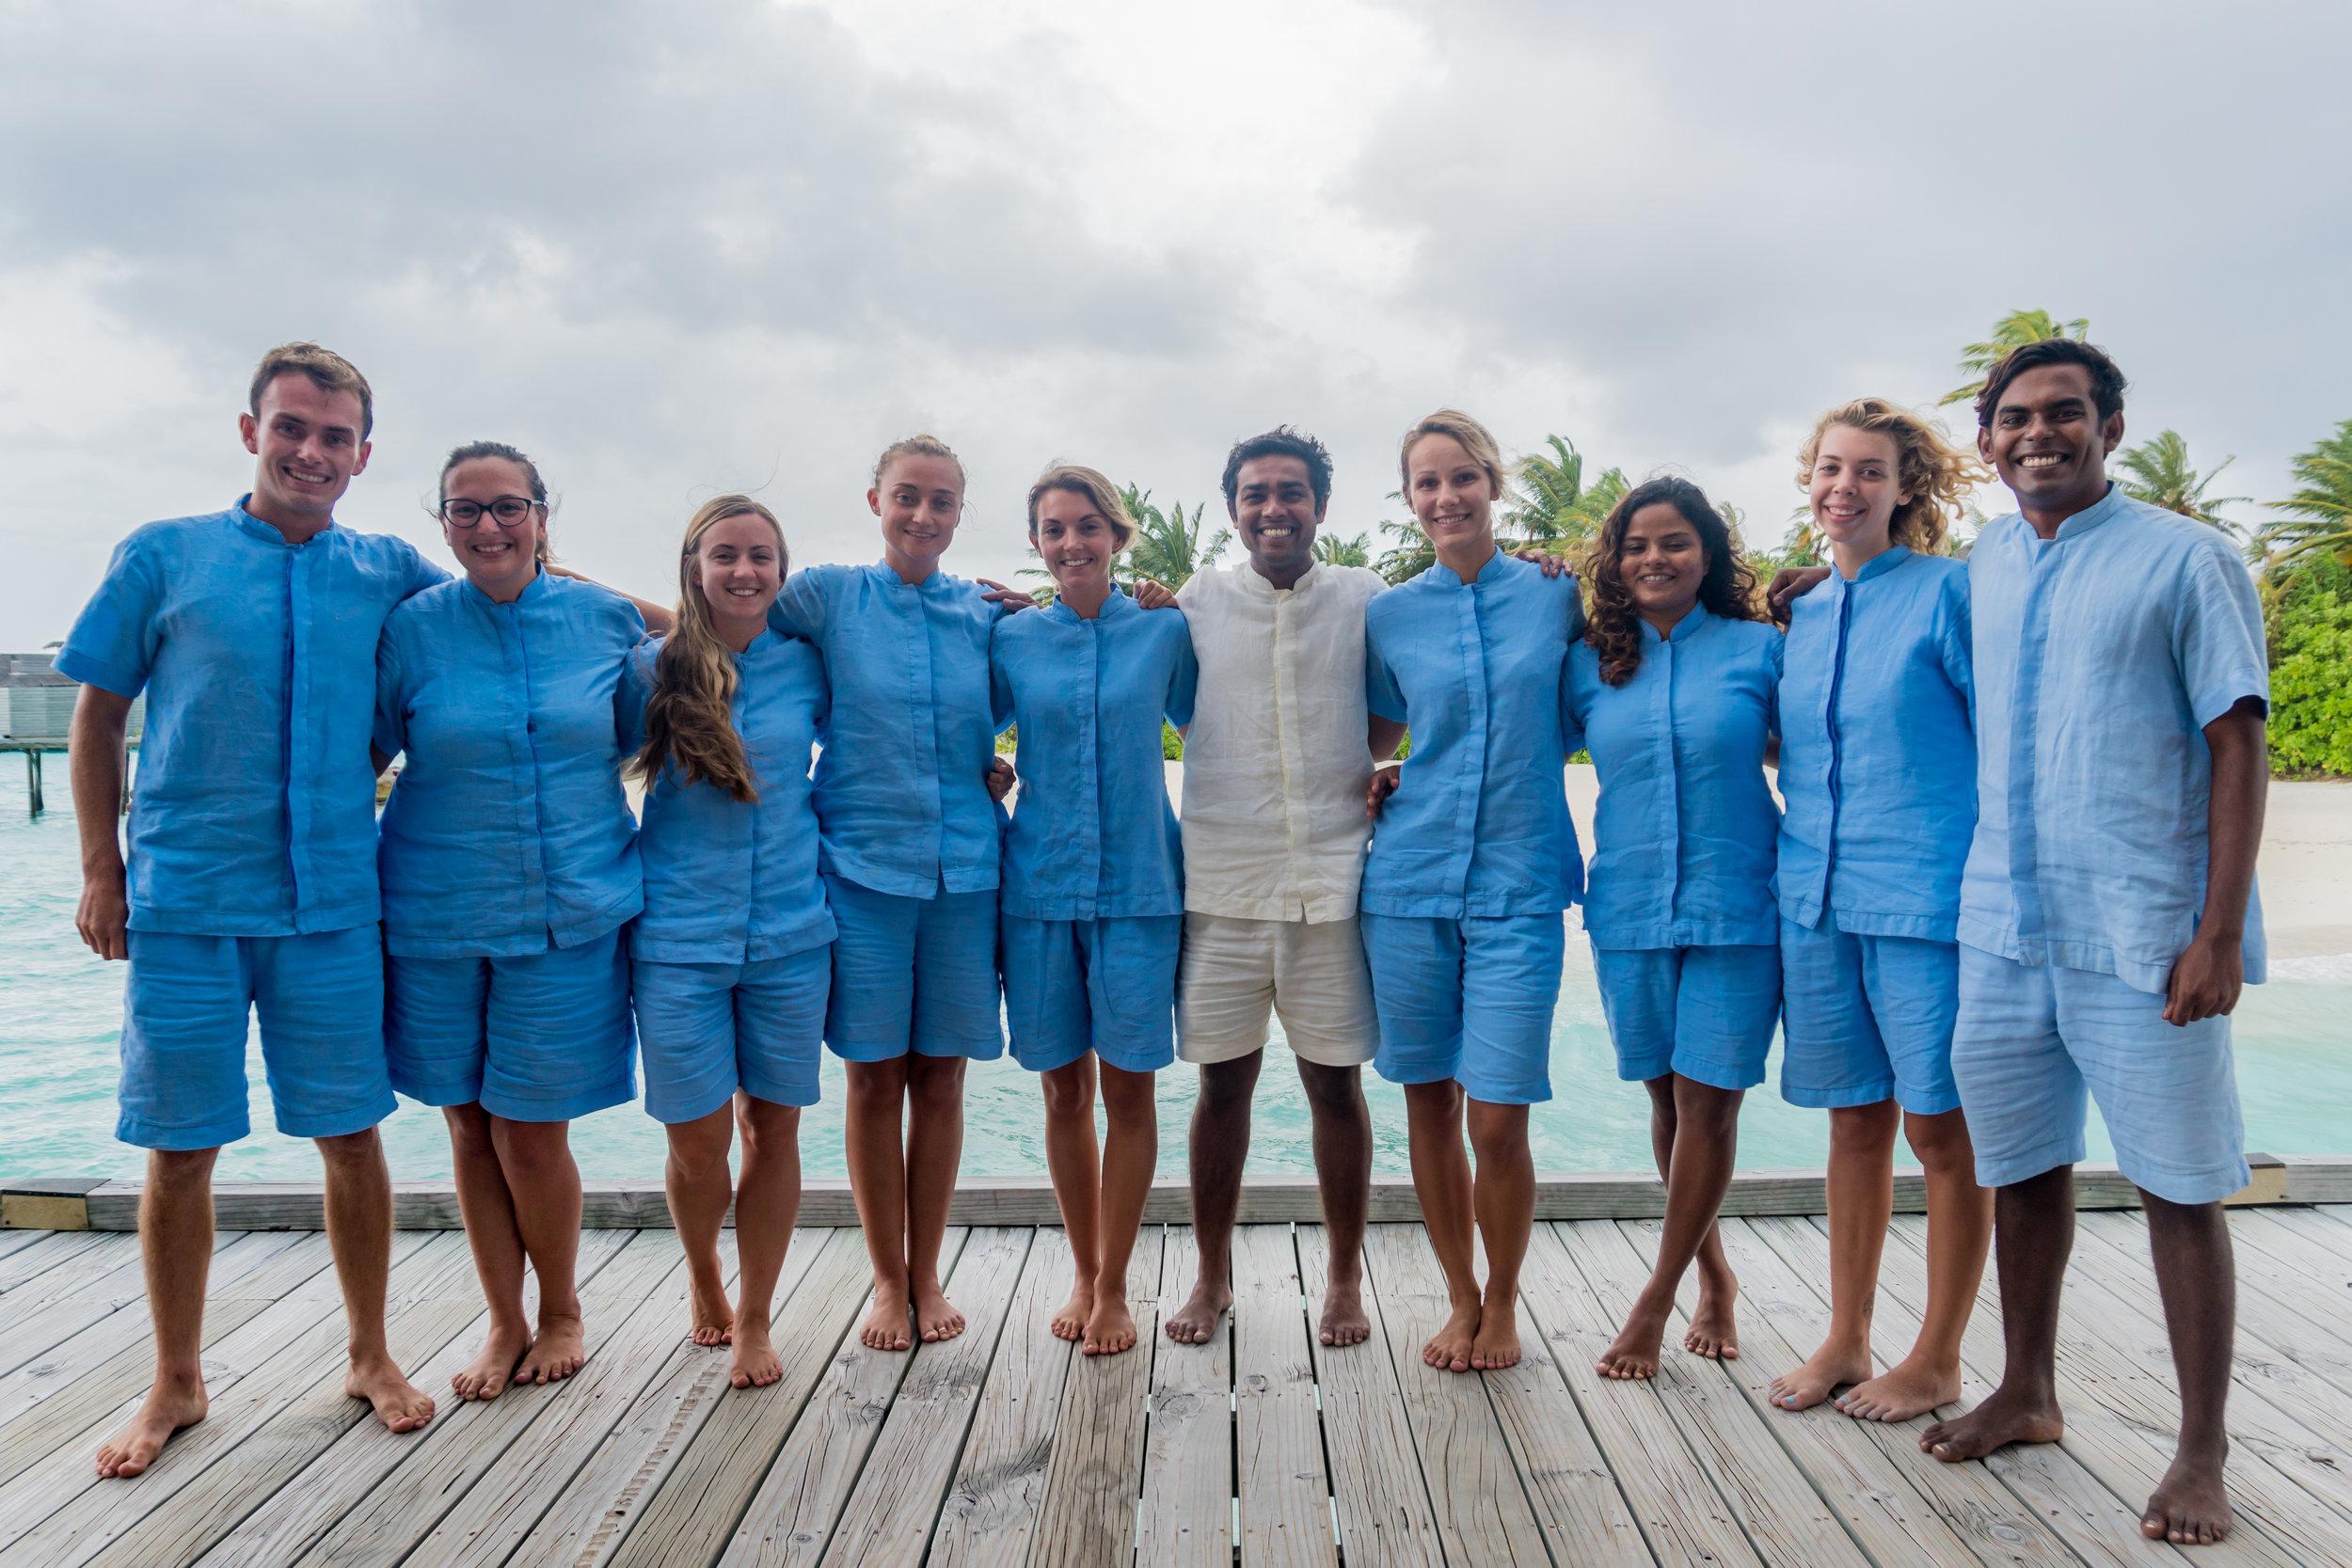 The team at Maldives Underwater Initiative. Photo: Tash Prokop